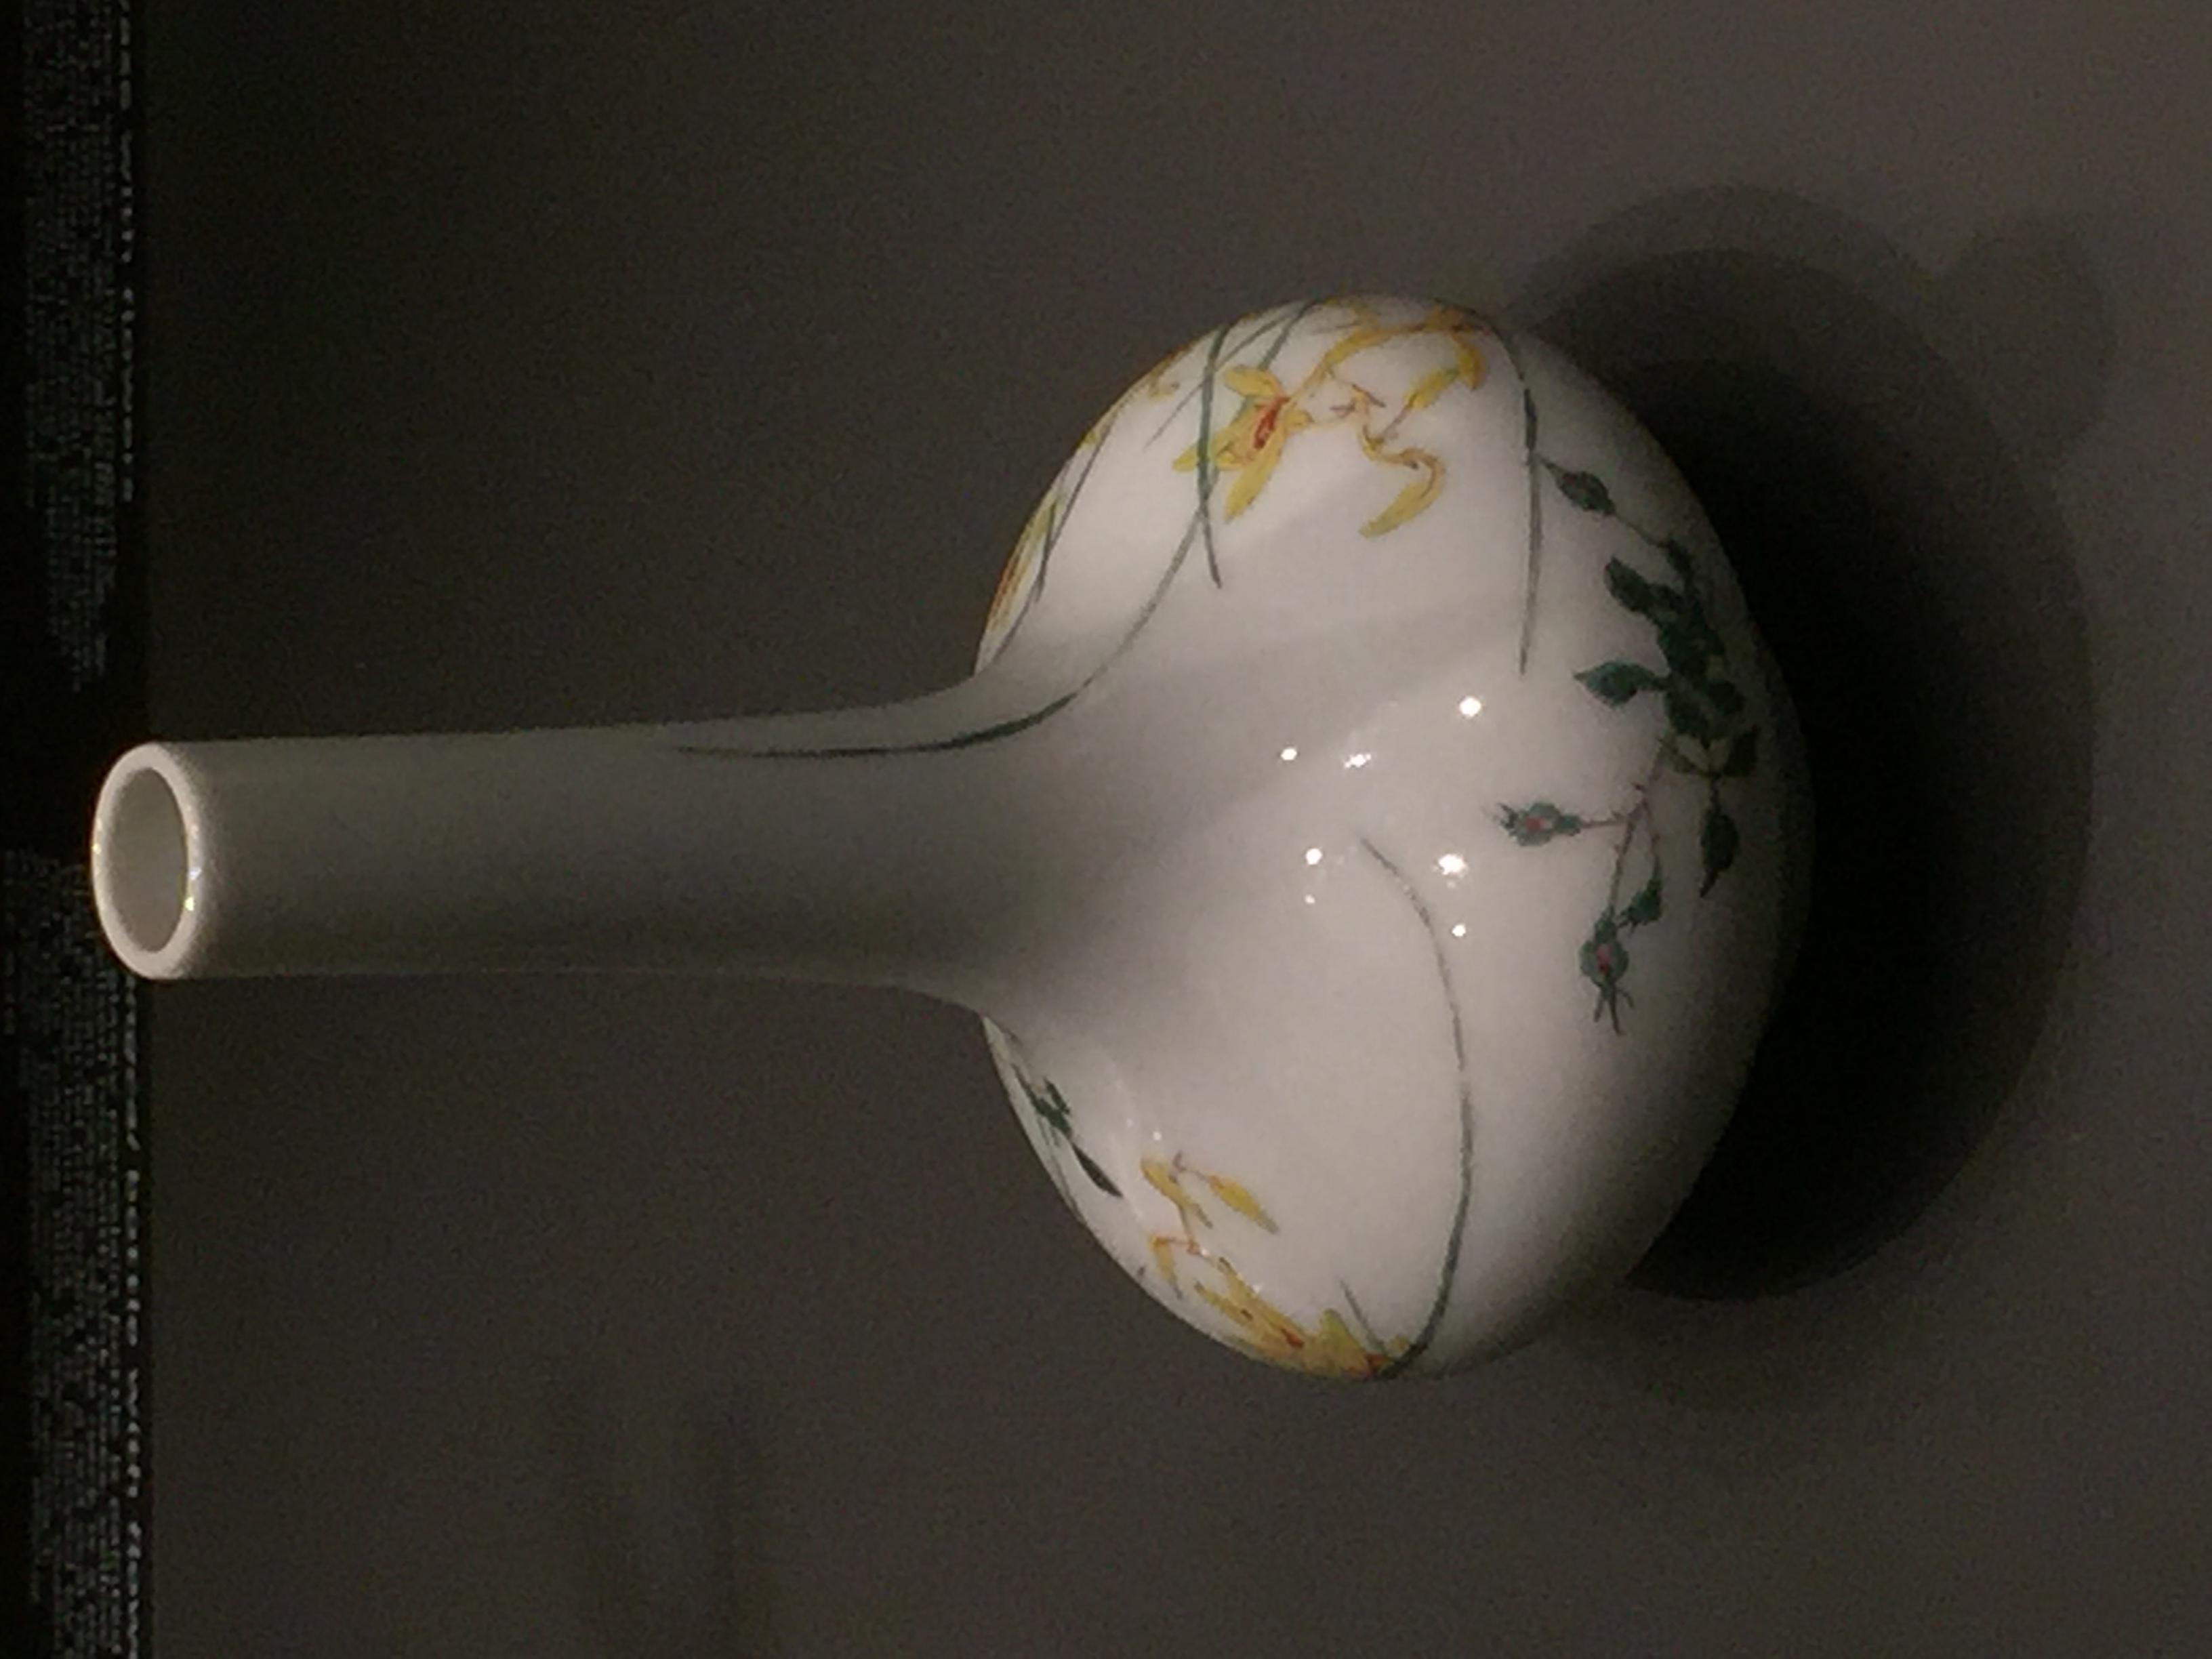 Chinese-Porcelain-British-Museum-Percival-David-jessewaugh.com-101.jpg